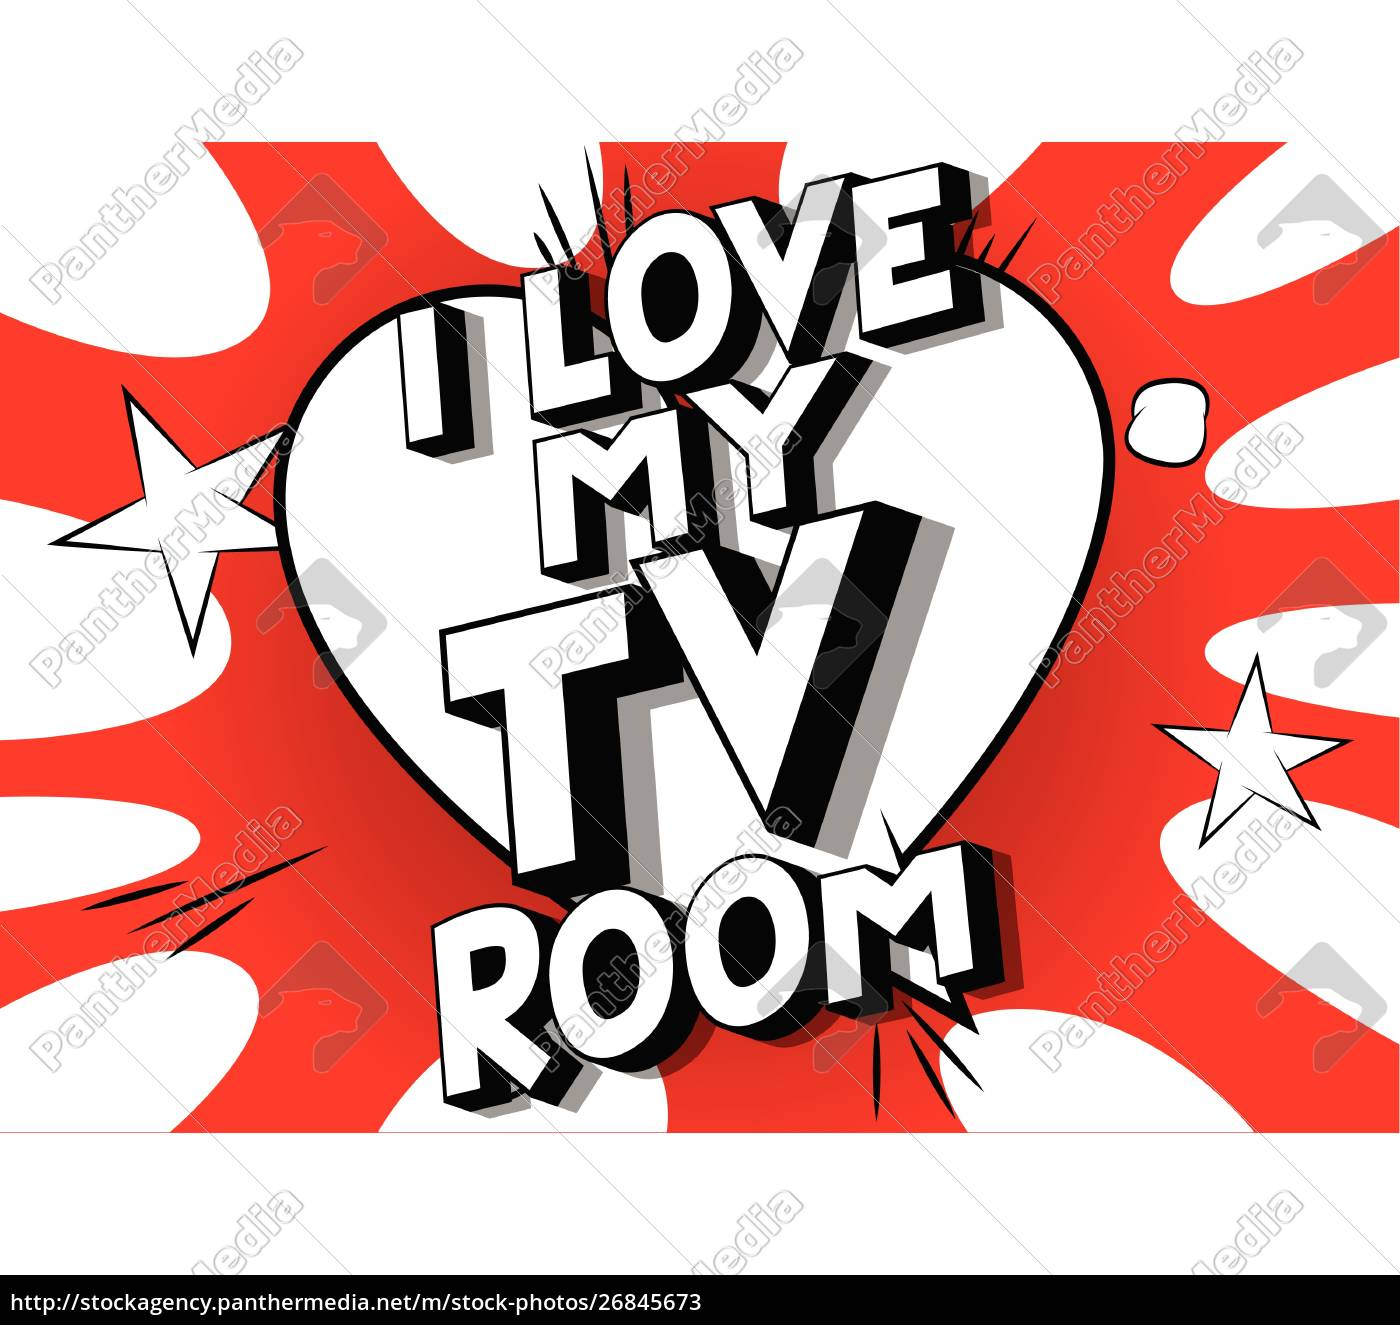 i, love, my, tv, room, - - 26845673